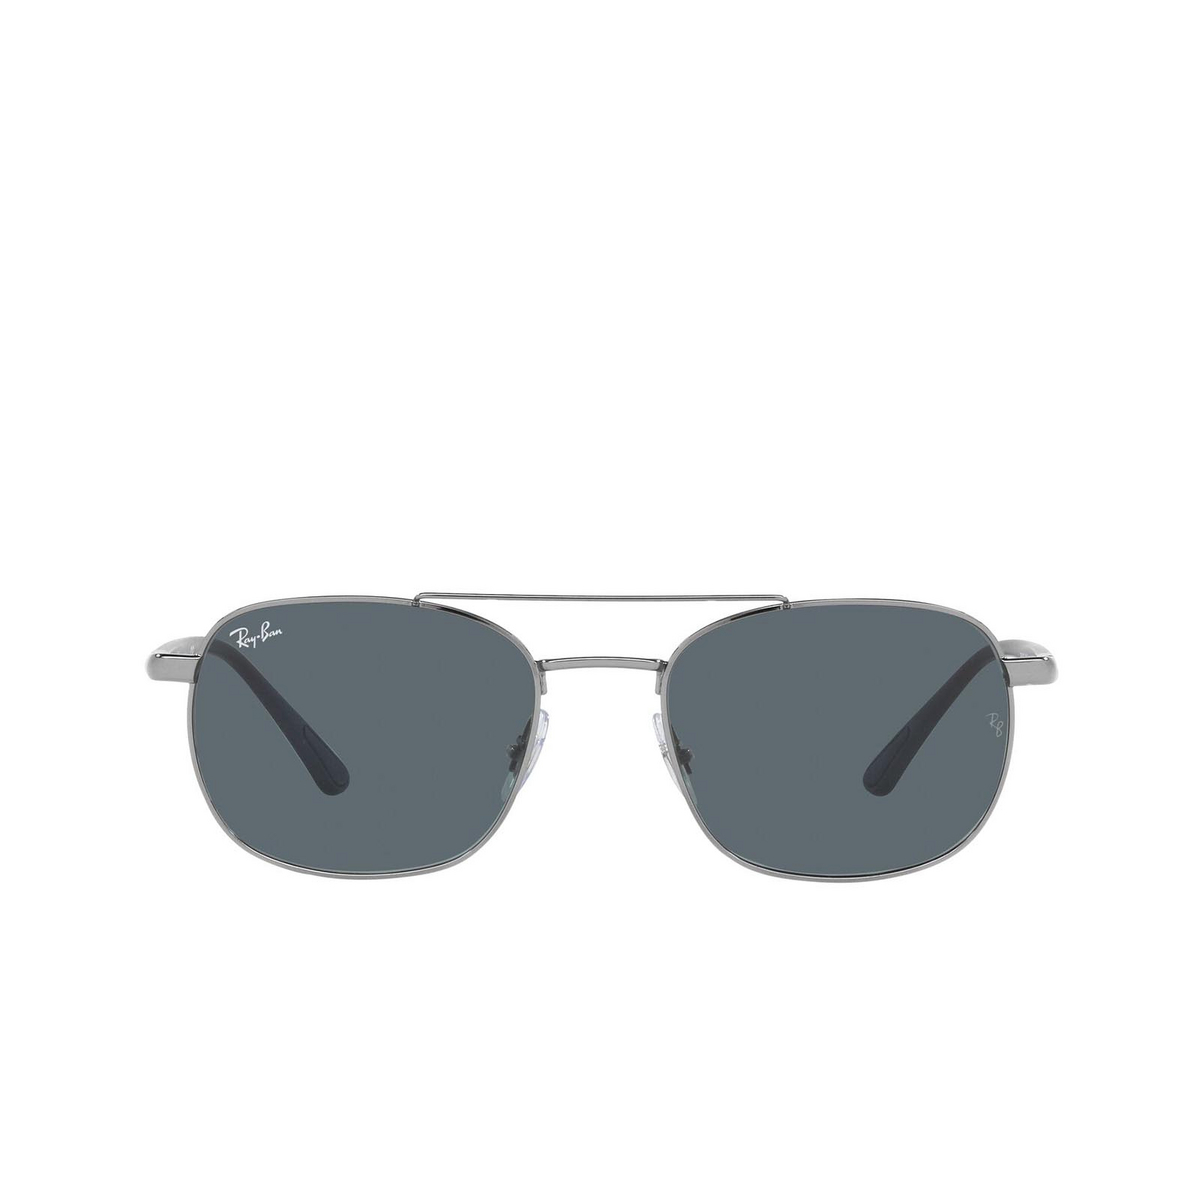 Ray-Ban® Square Sunglasses: RB3670 color Gunmetal 004/R5.